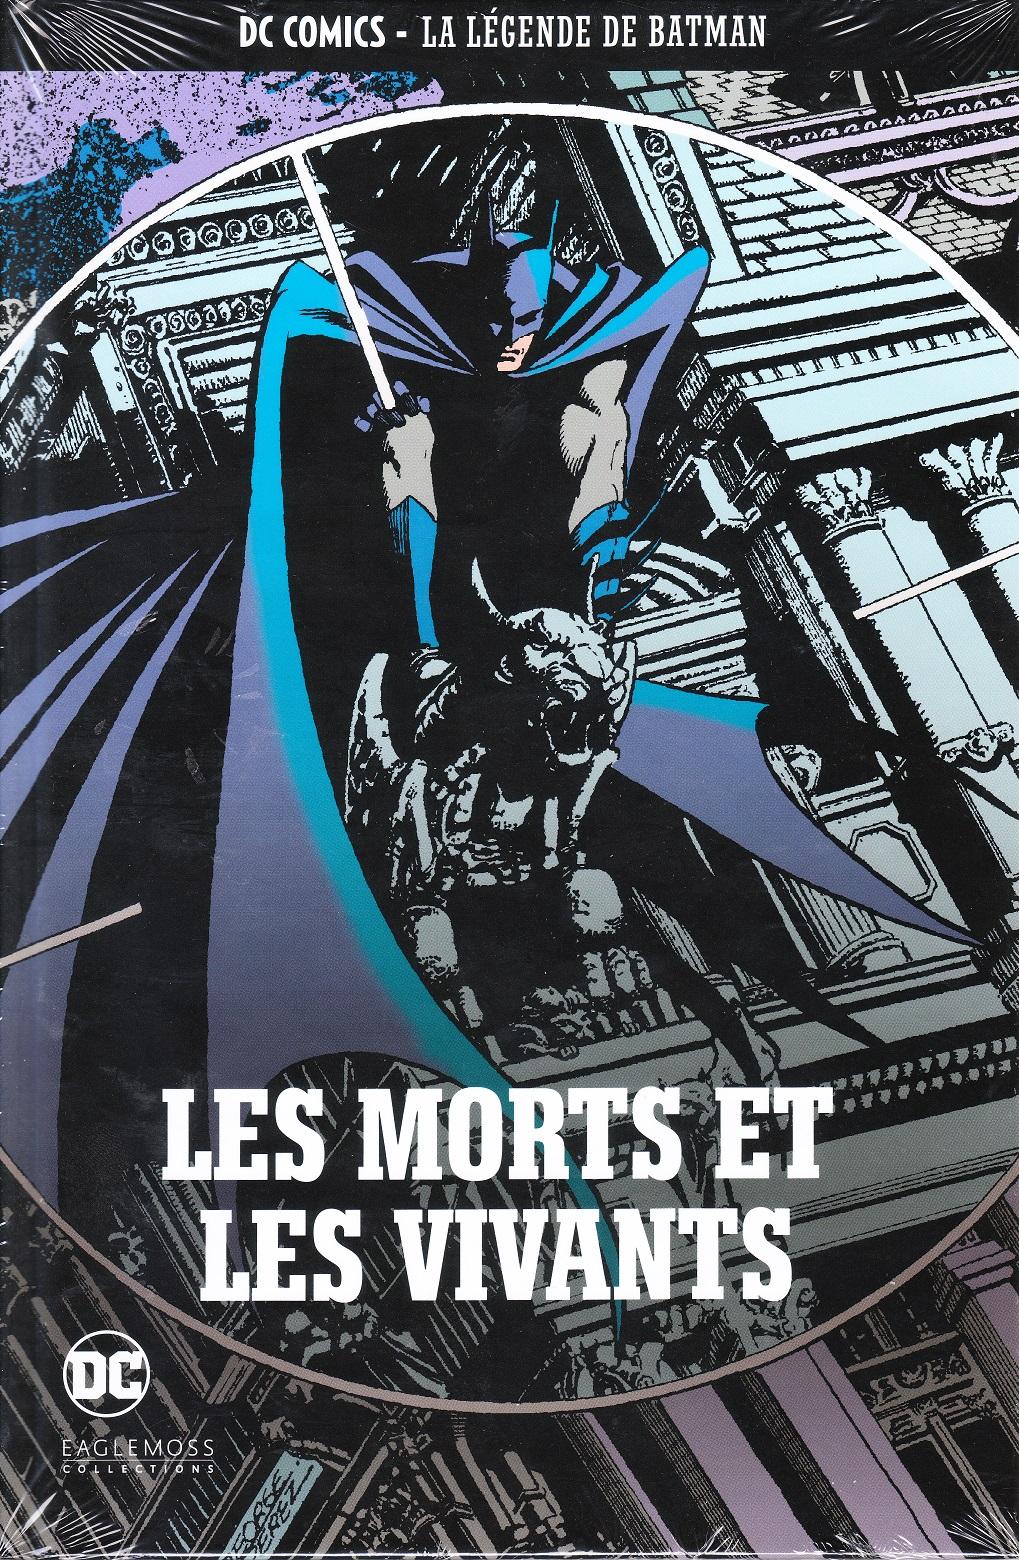 DC Comics - La Légende de Batman 18 - Les Morts et les Vivants